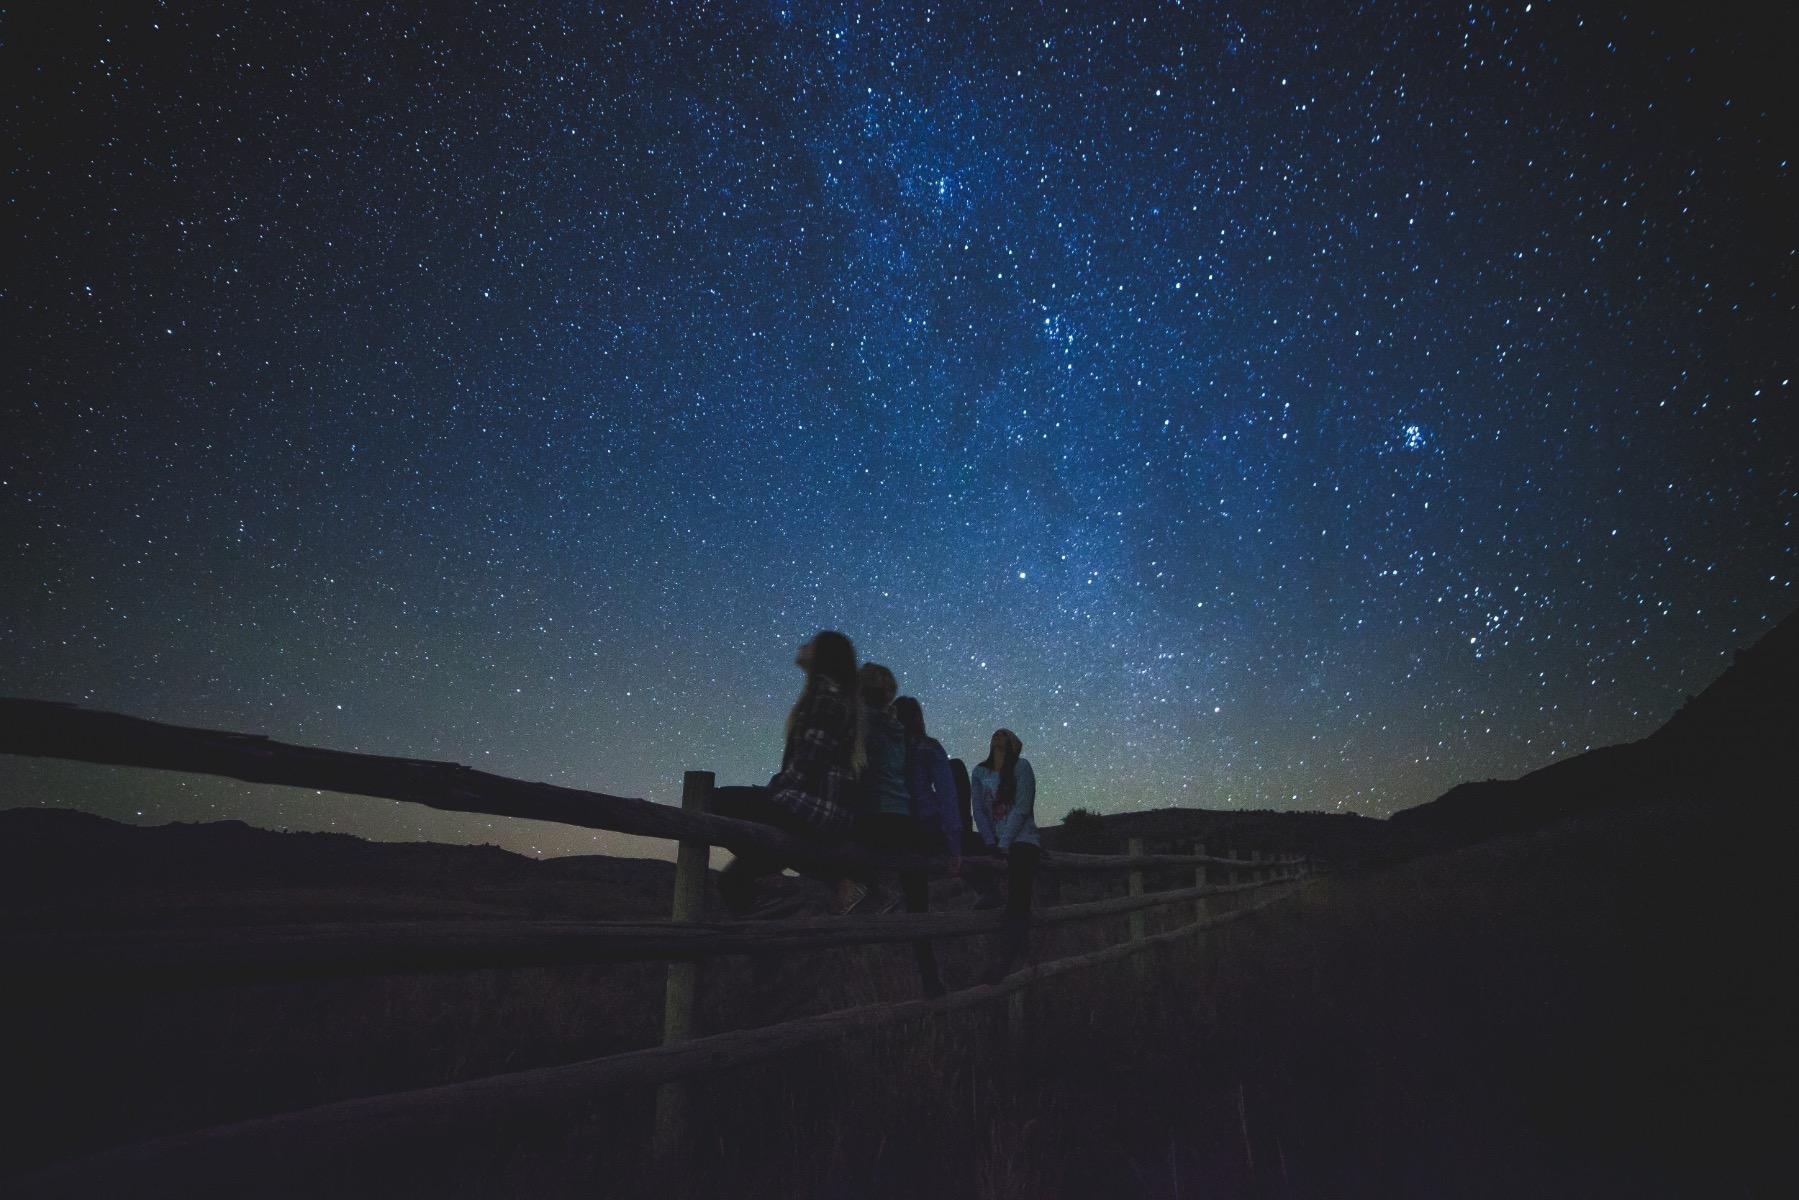 a beautifully lit night sky